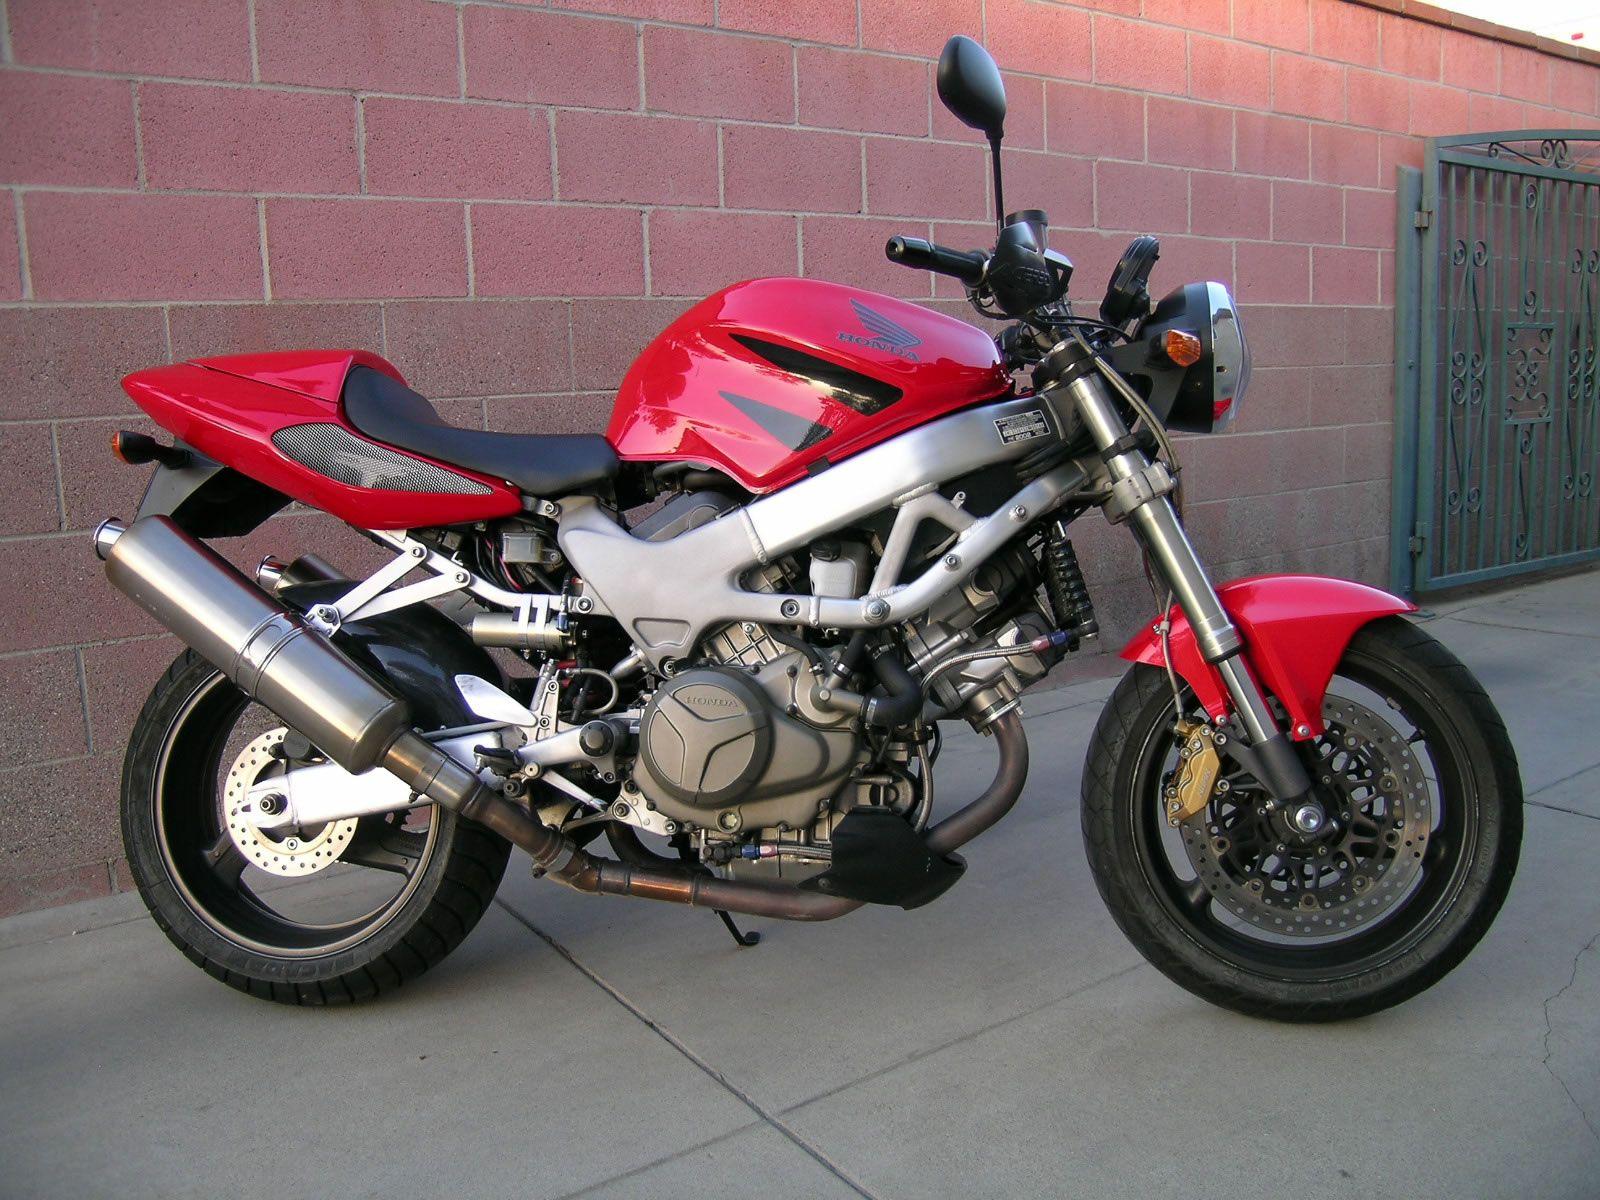 VTR 1000 Super Hawk - Another Super Subtle Custom Build by